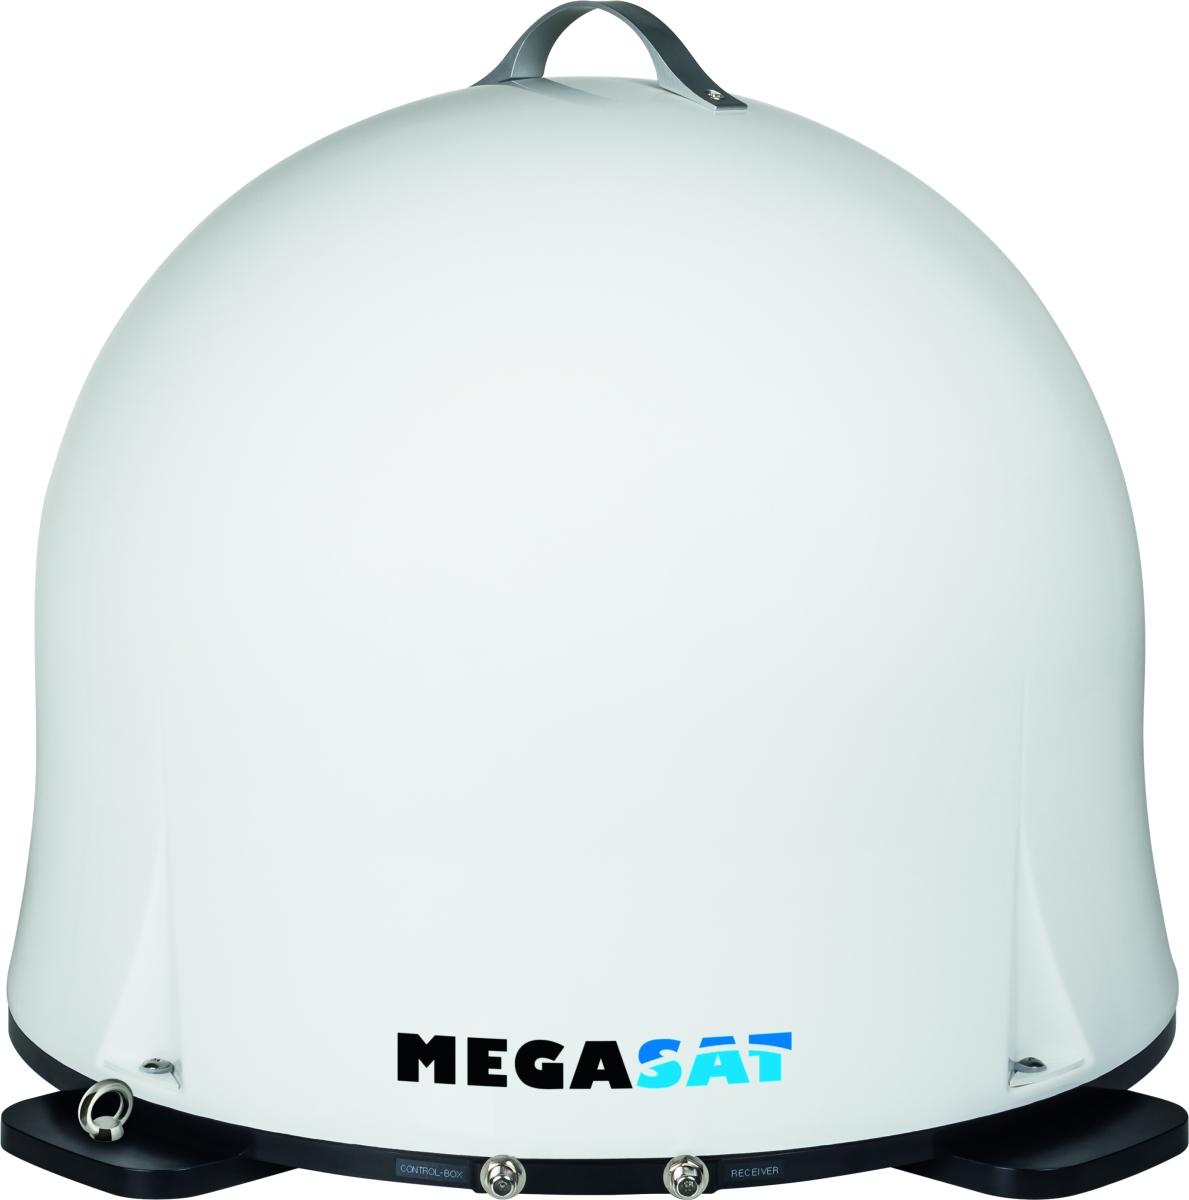 Megasat Campingman Portable 3